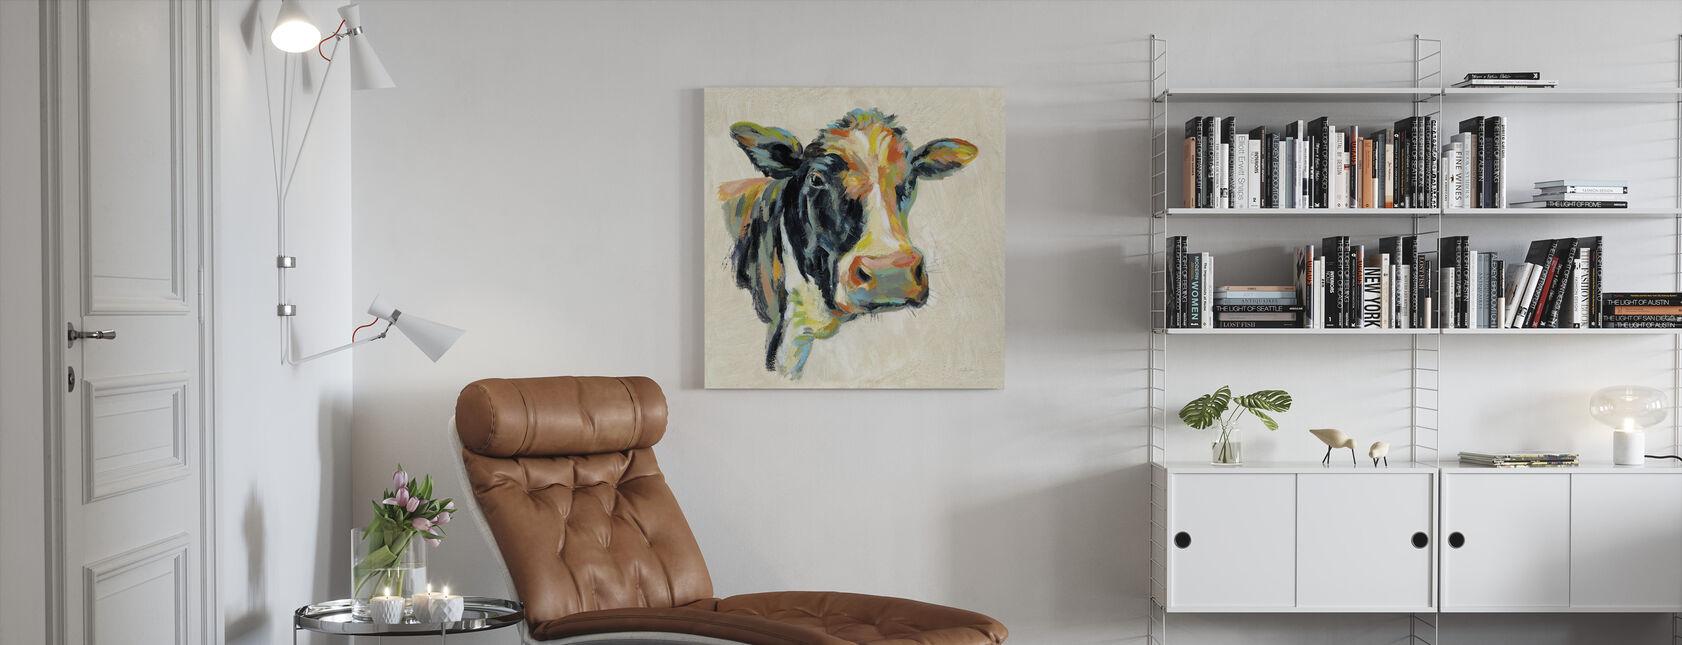 Expressionistic Cow I - Canvas print - Living Room